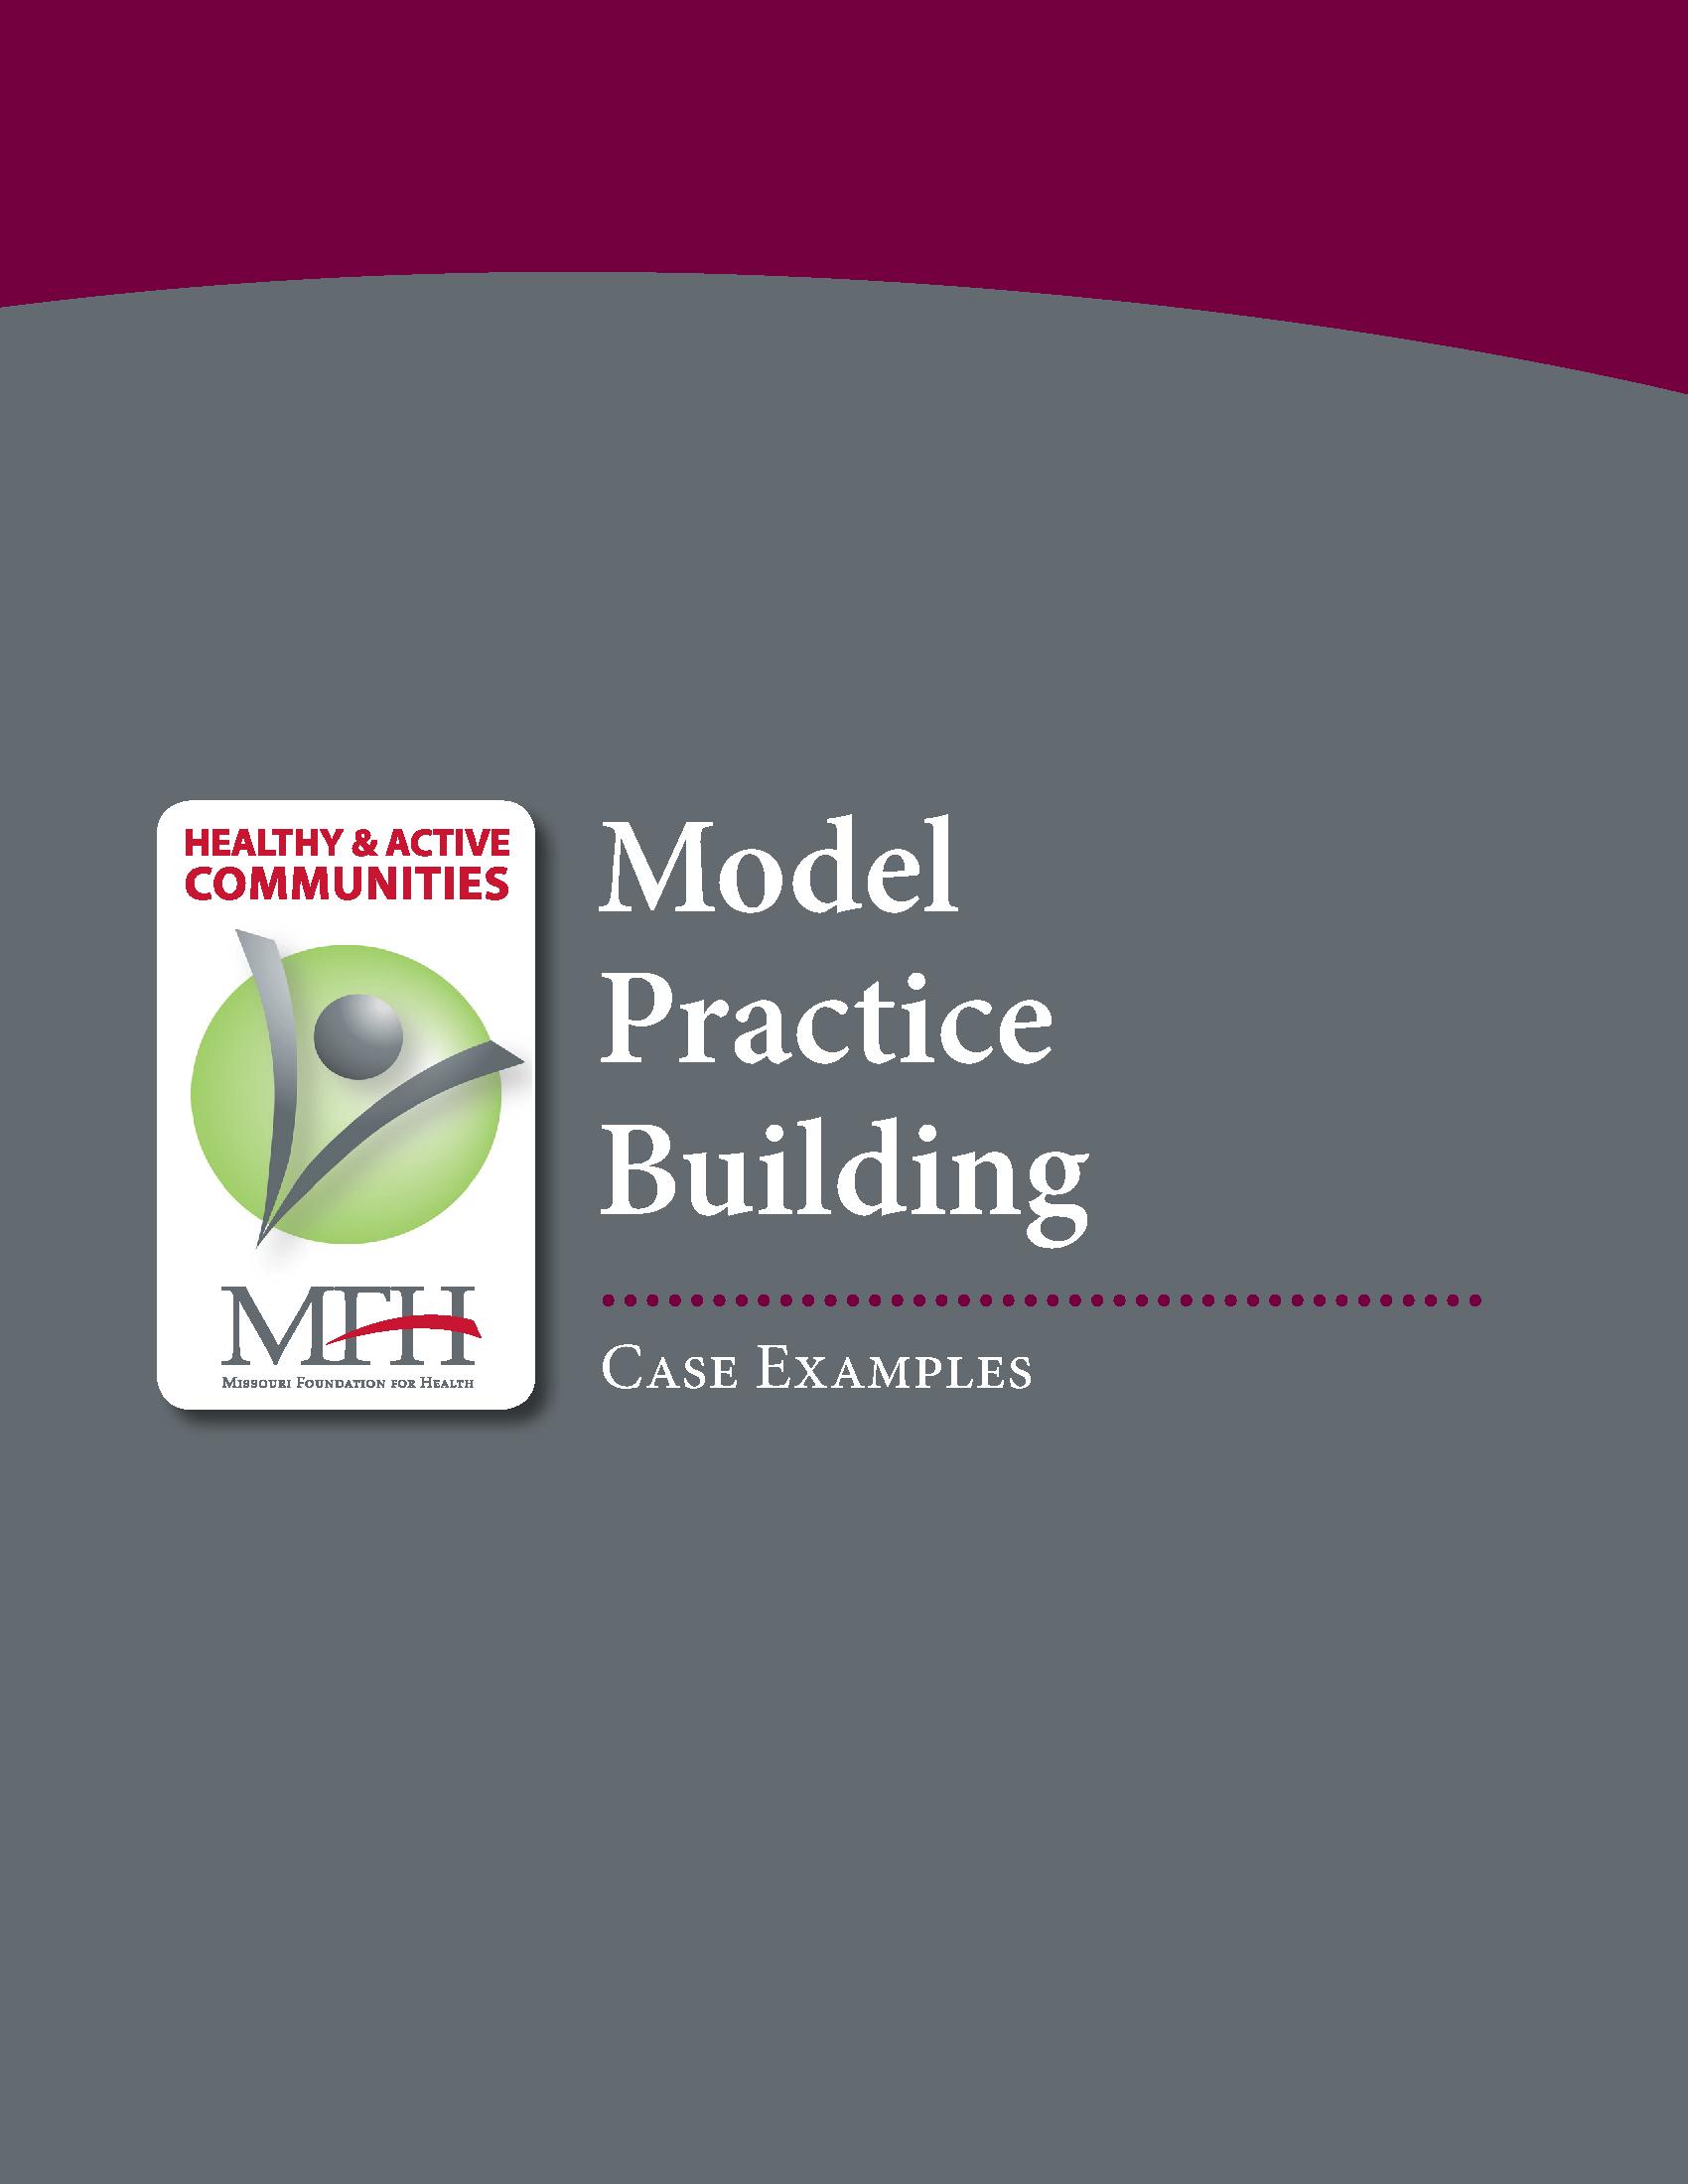 Healthy & Active Communities Model Practices Case Examples 2012